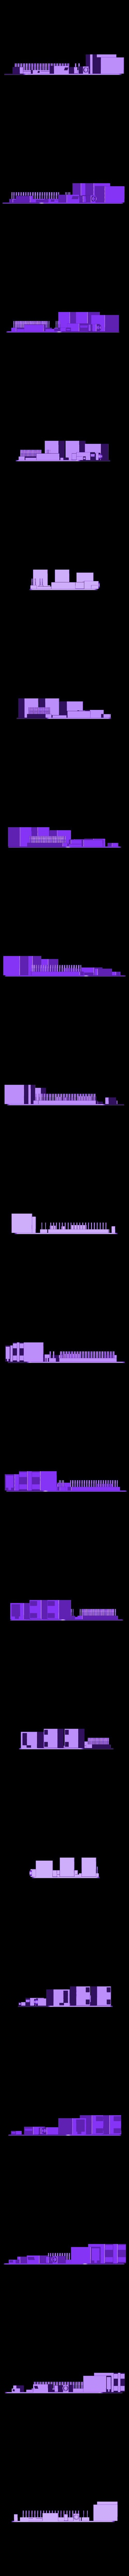 Raspberry_Pi_3B%2B_Sleeve.Raspberry_Pi_3B..Body1.stl Télécharger fichier STL gratuit Raspberry Pi 3B+ Sleeve • Design à imprimer en 3D, Wilko